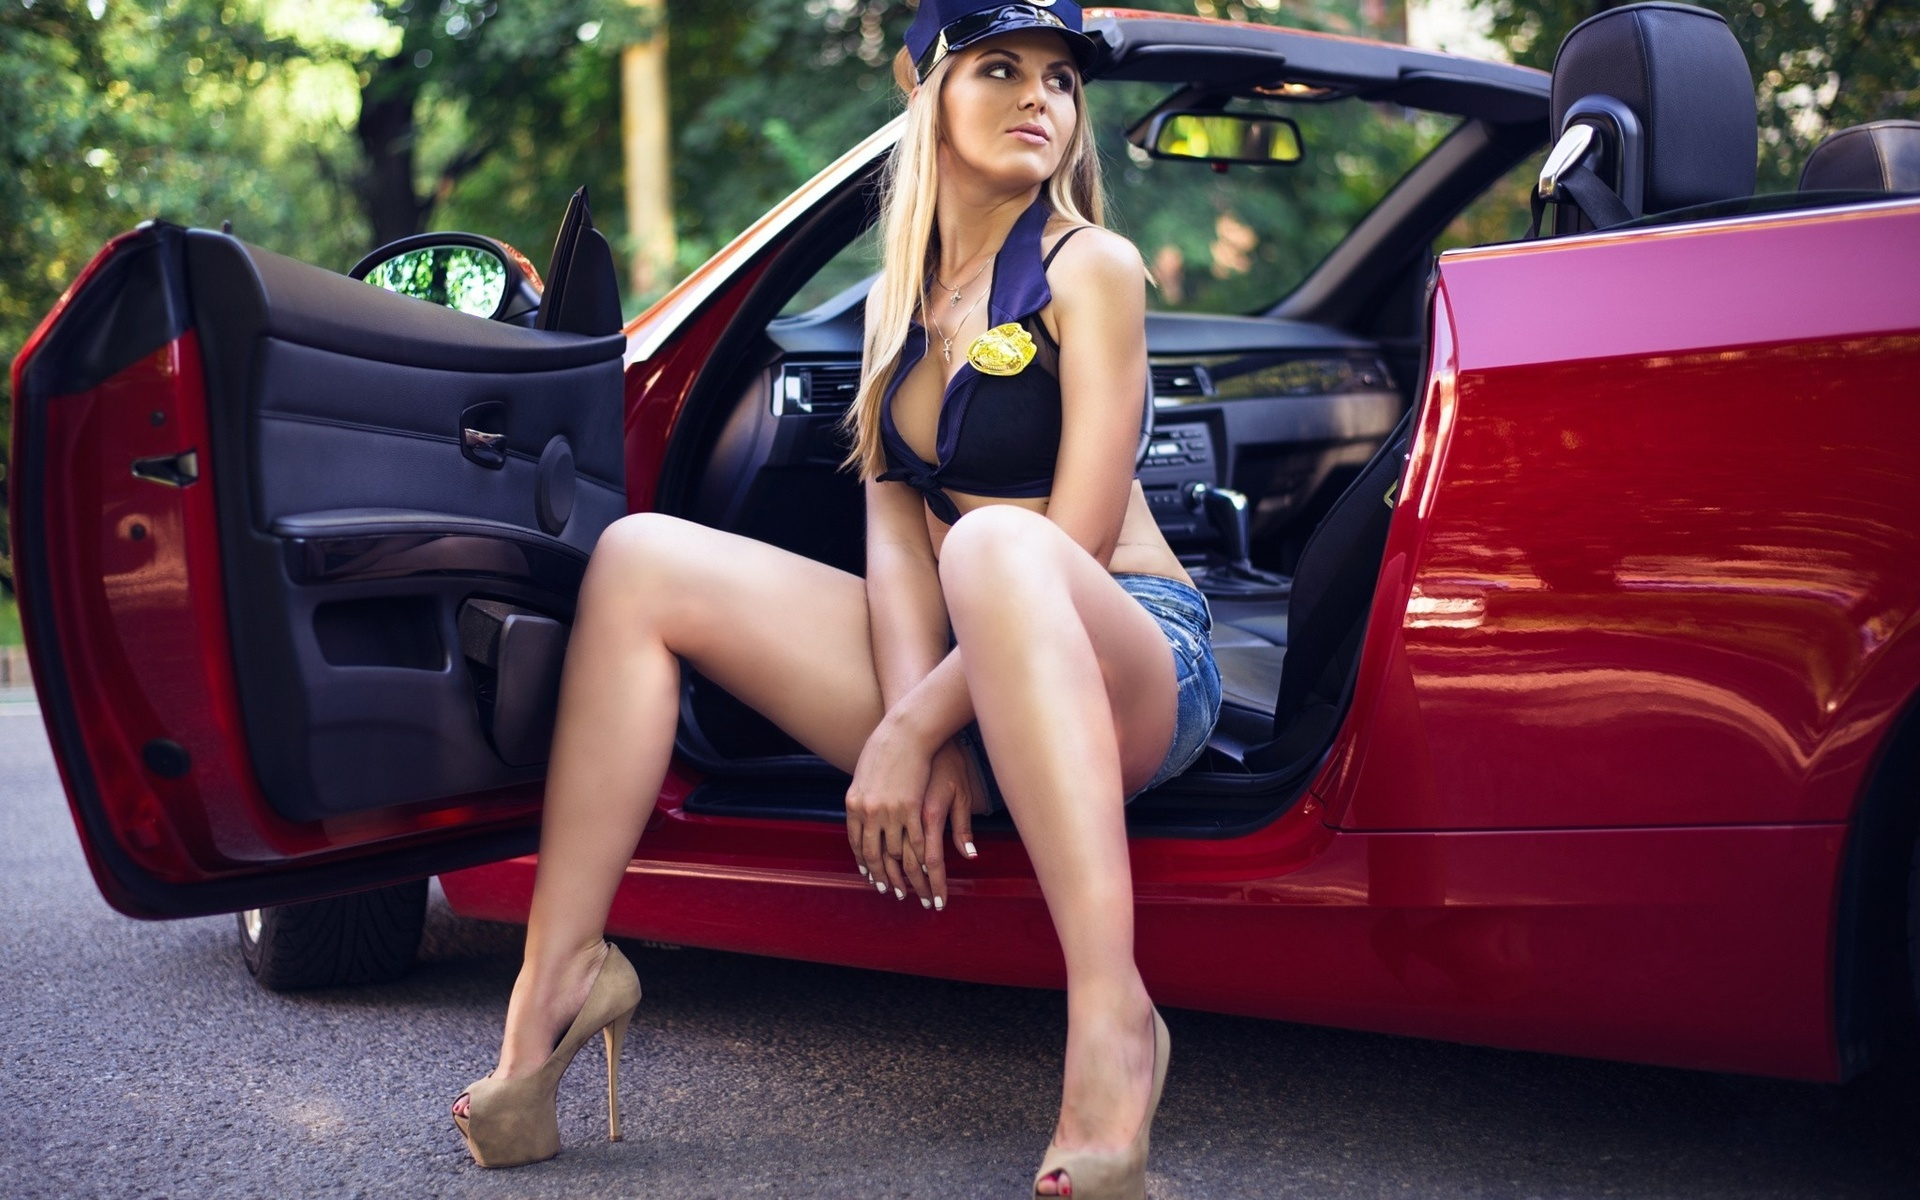 Women posing on cars 15